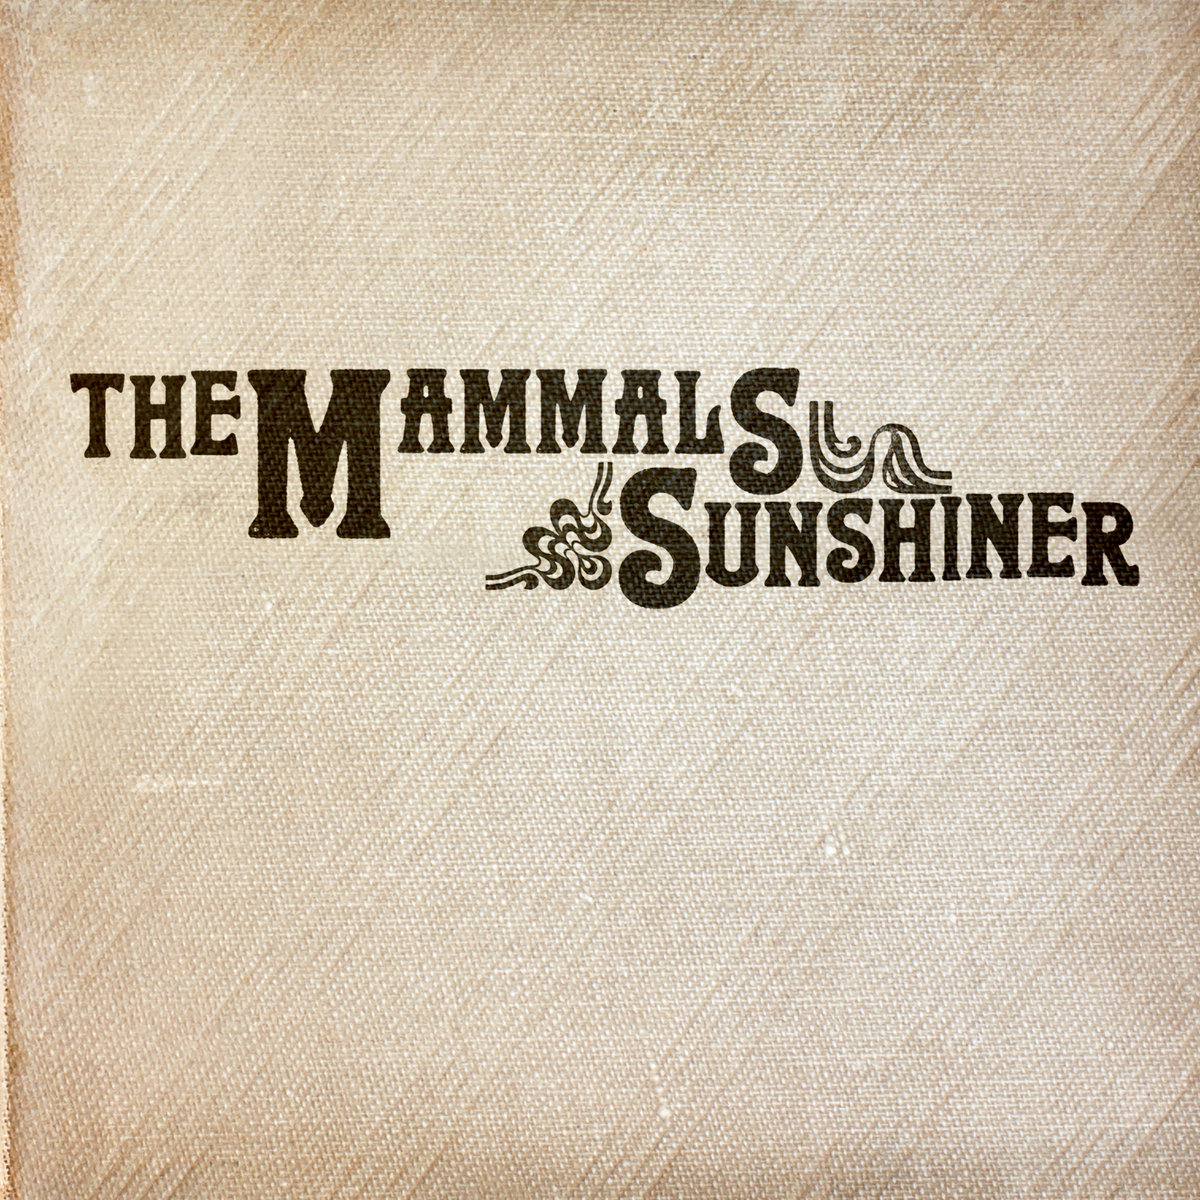 the mammals sunshiner